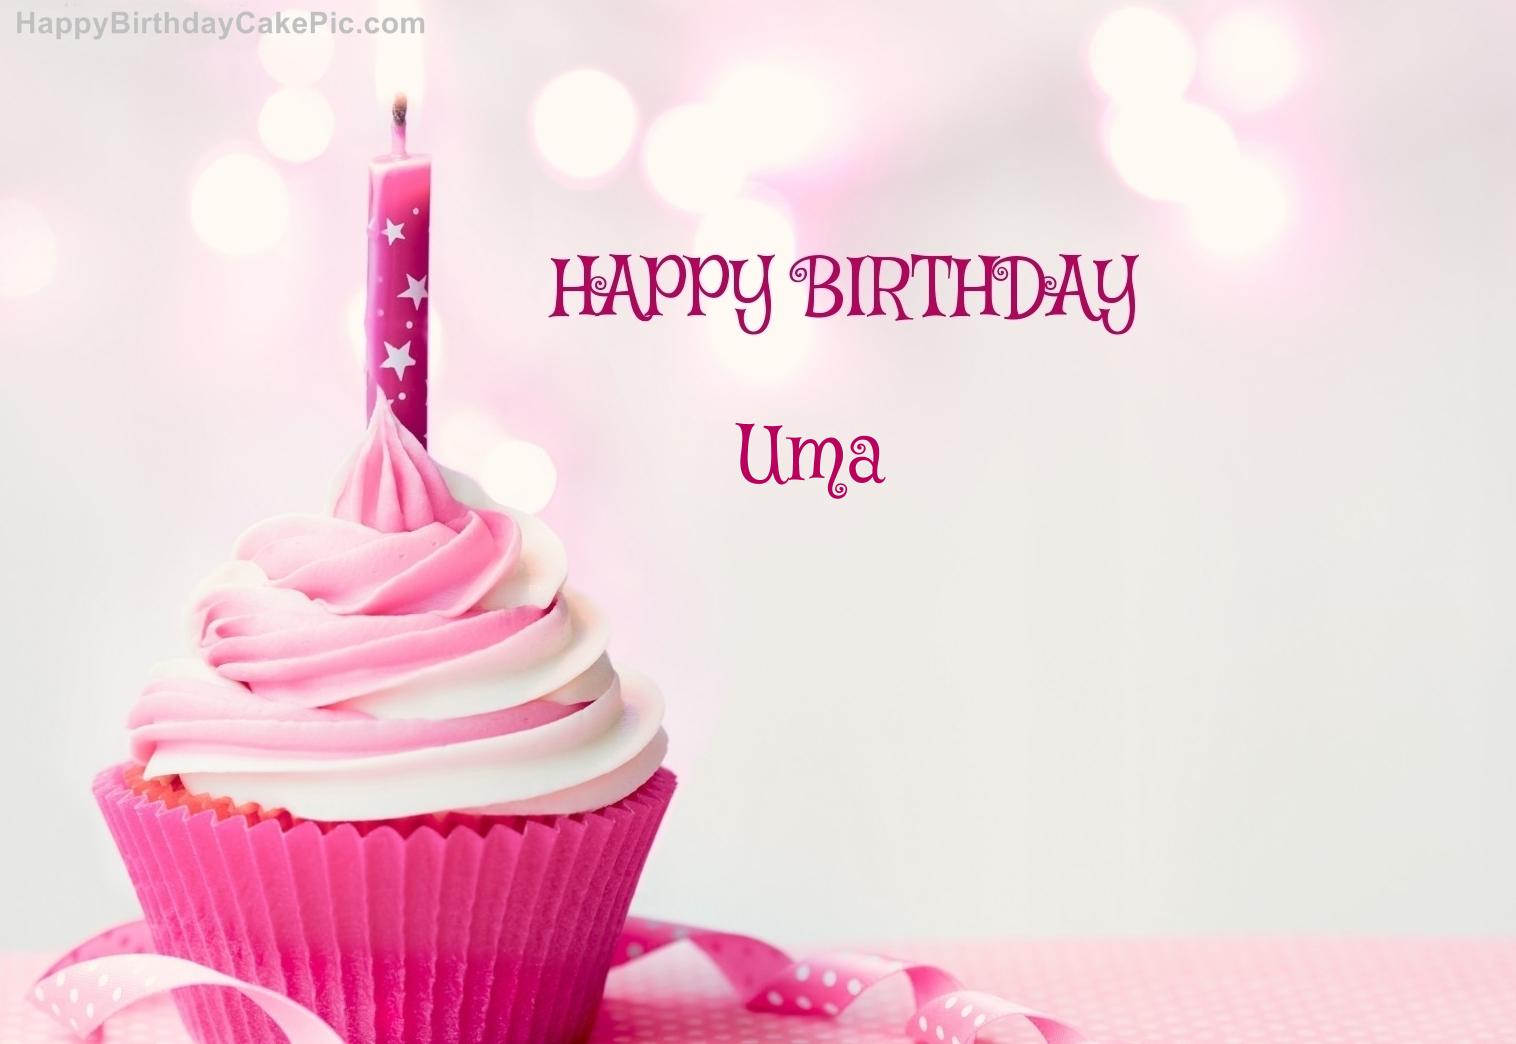 Happy Birthday Uma Aka 3dancelover